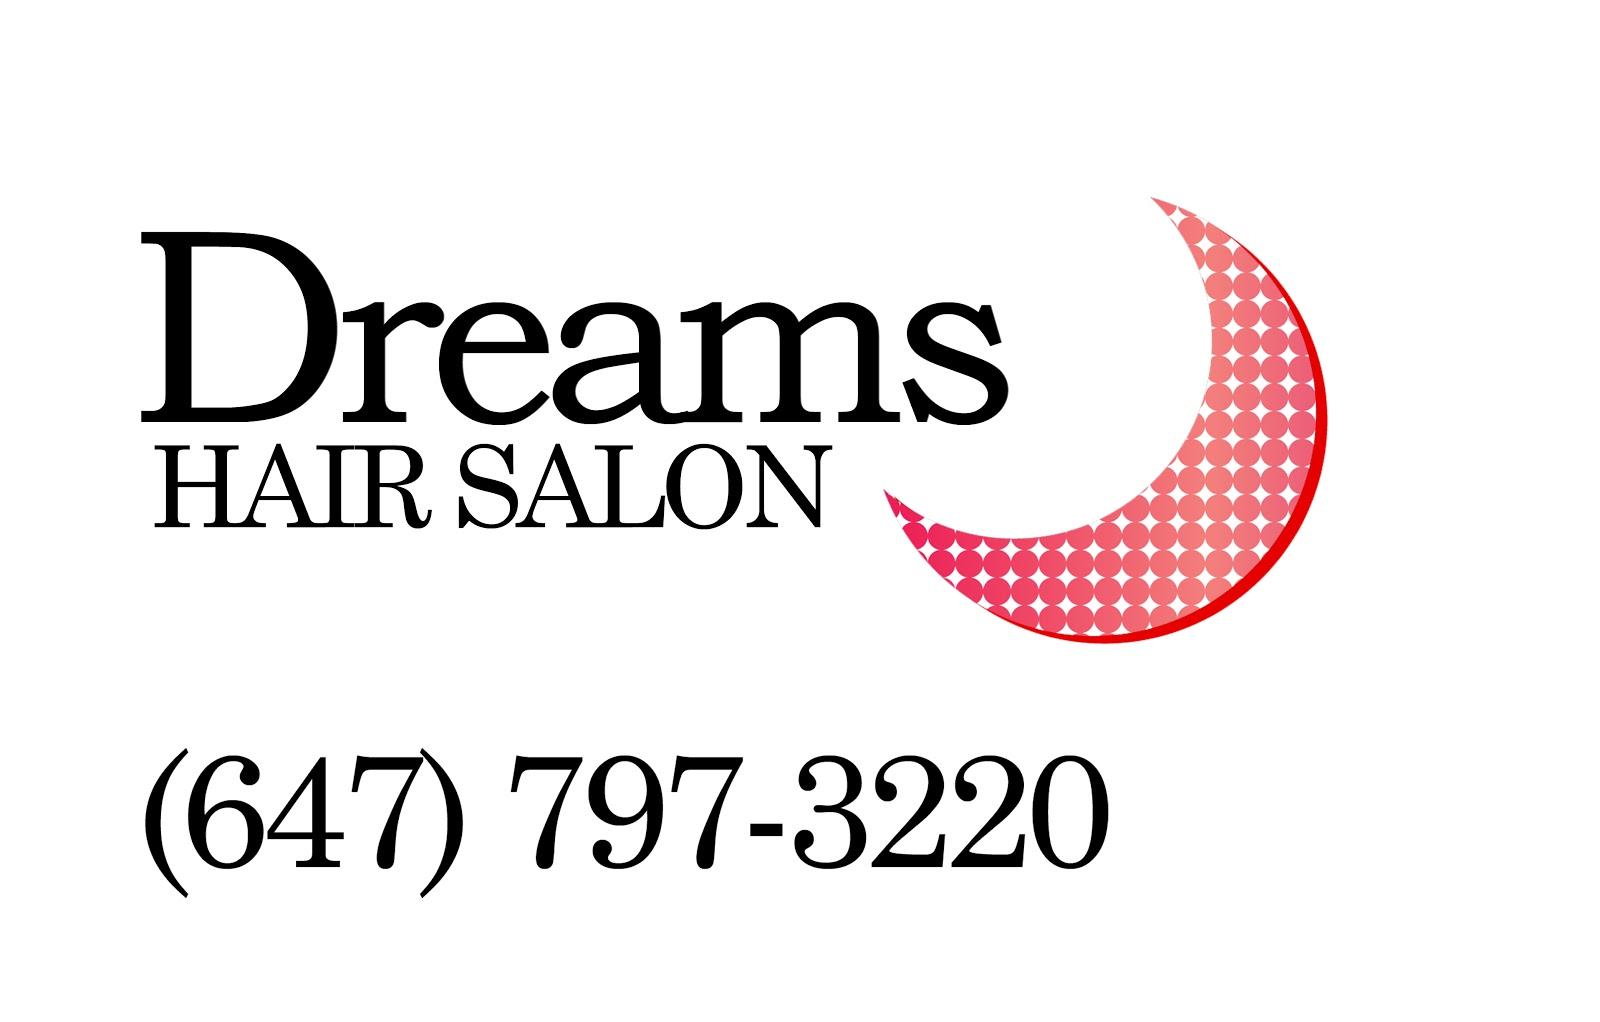 Hair Salon Logos and Clip Art, Hair Salon Logo Ideas Dreams hair.